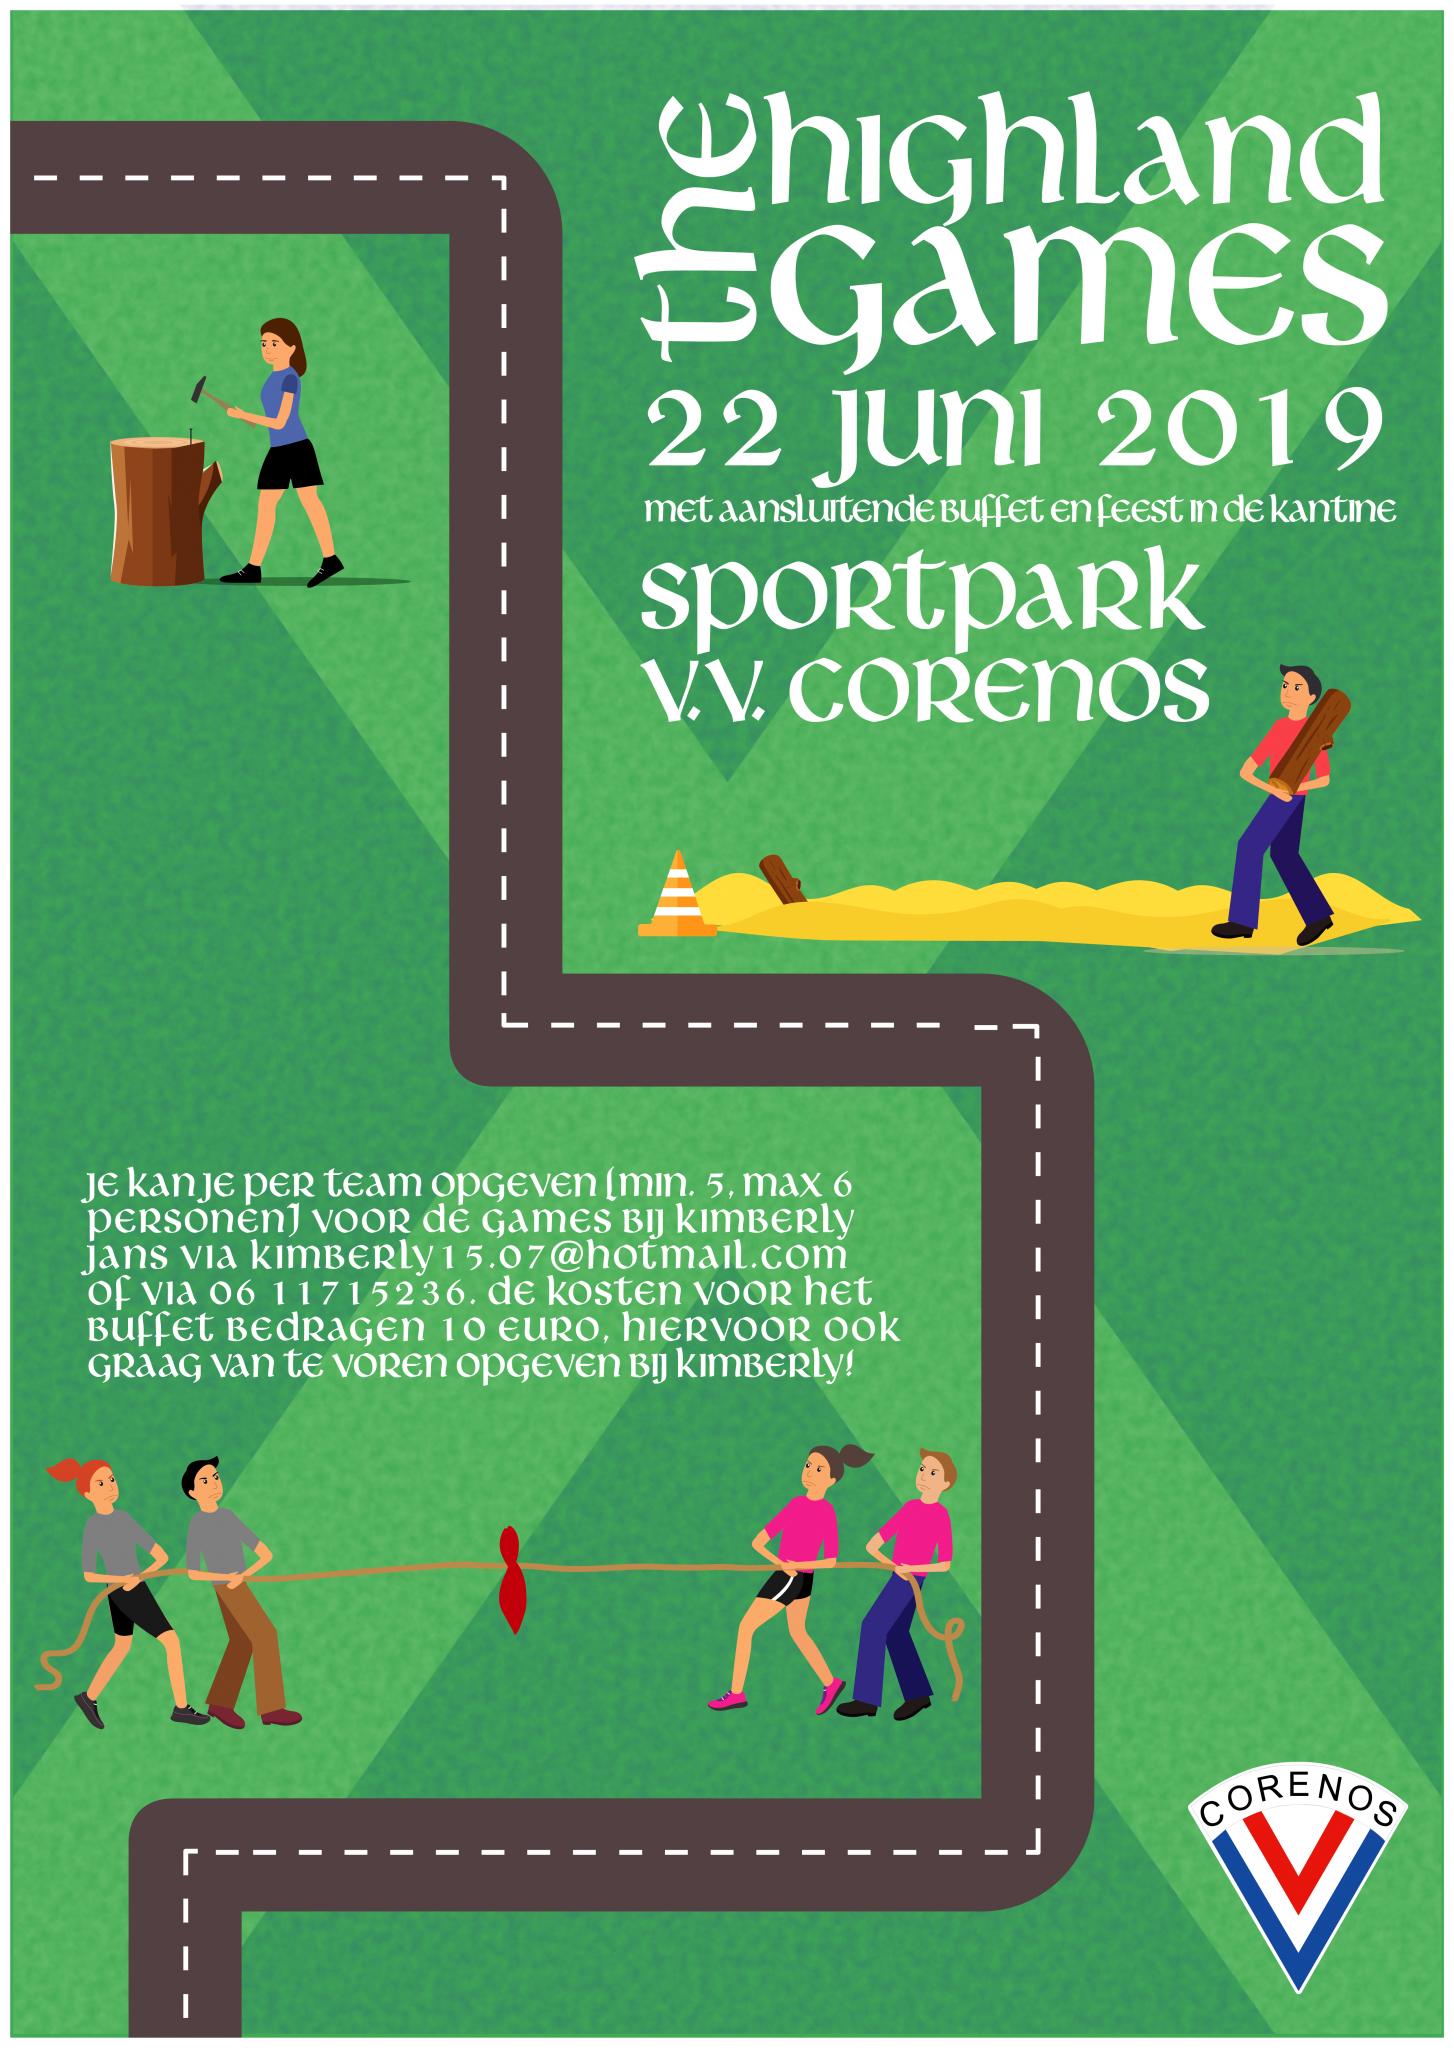 Seizoensafsluiting 22 juni 2019: Highland Games